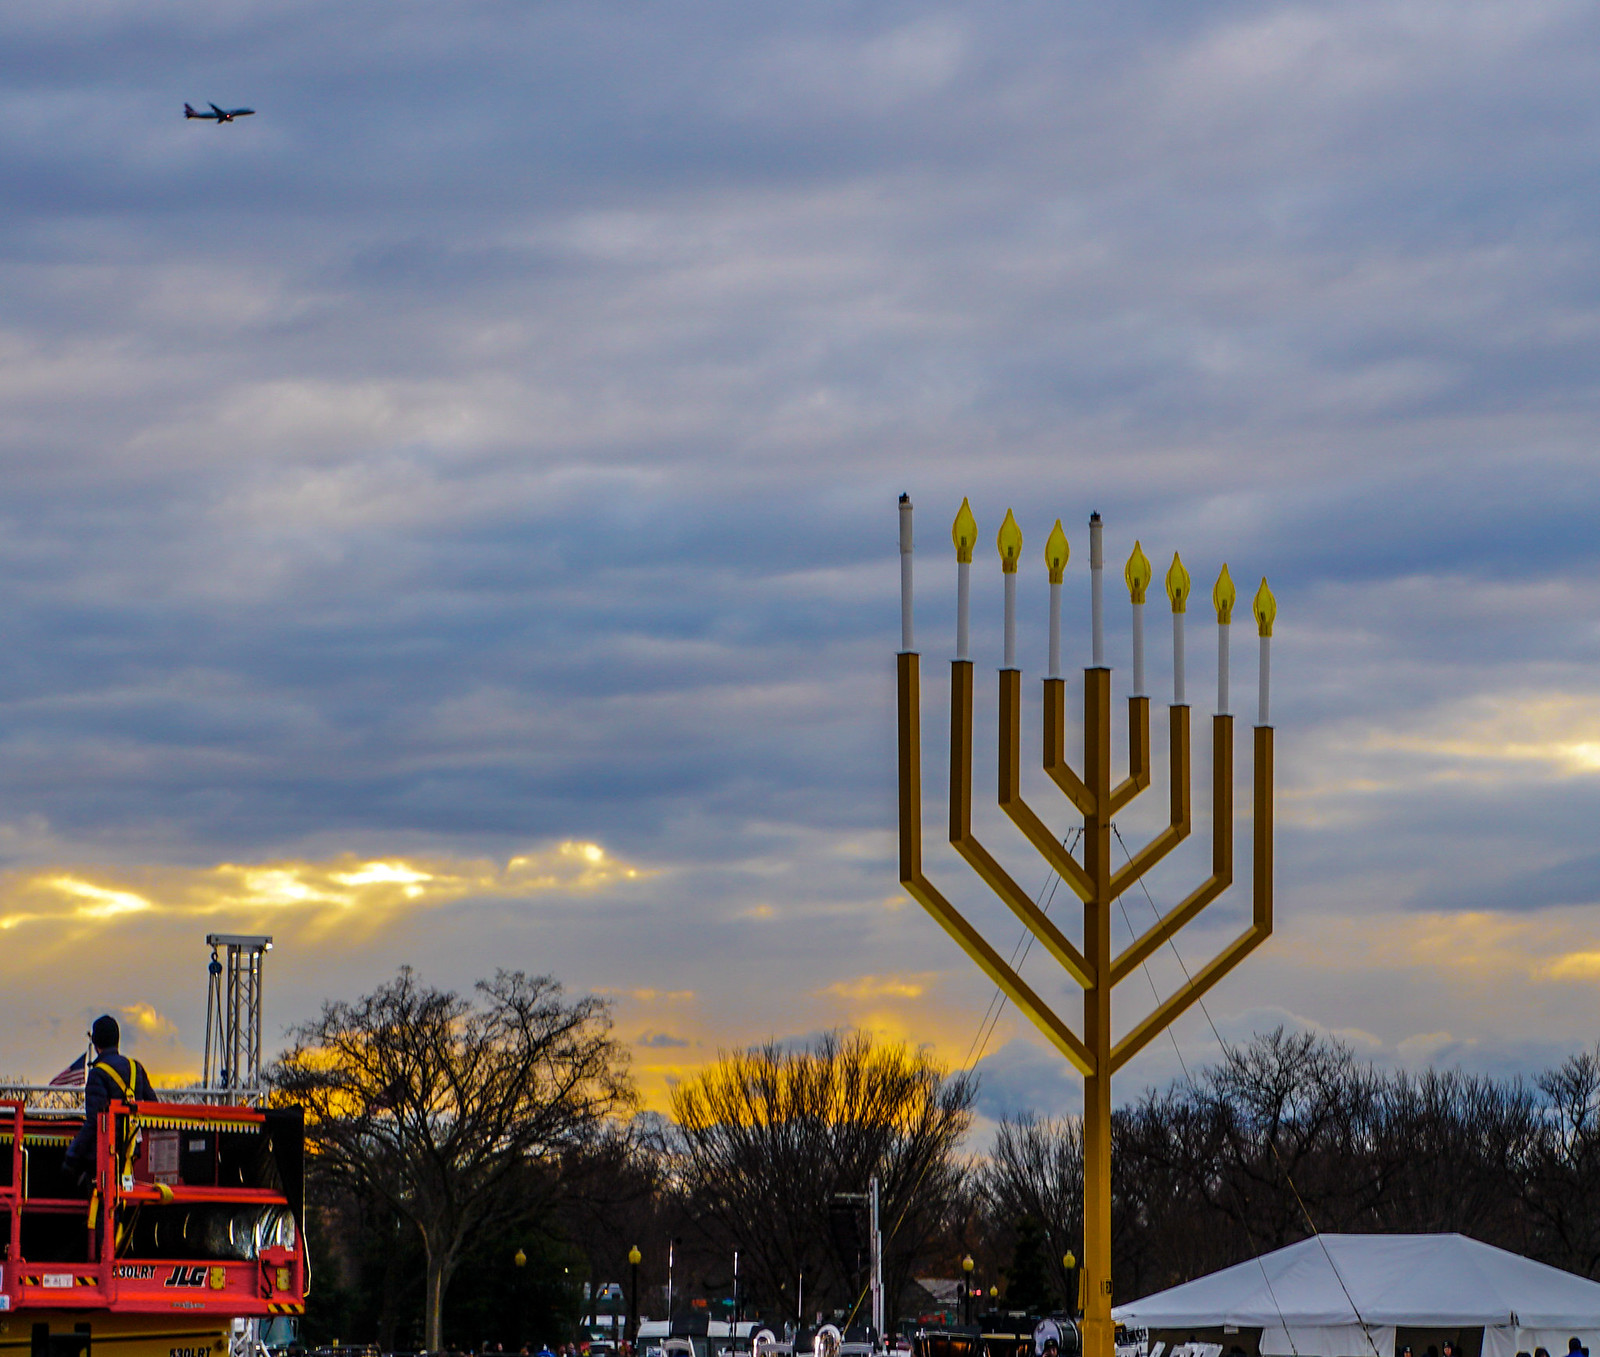 2017.12.12 National Menorah, Washington, DC USA 1364